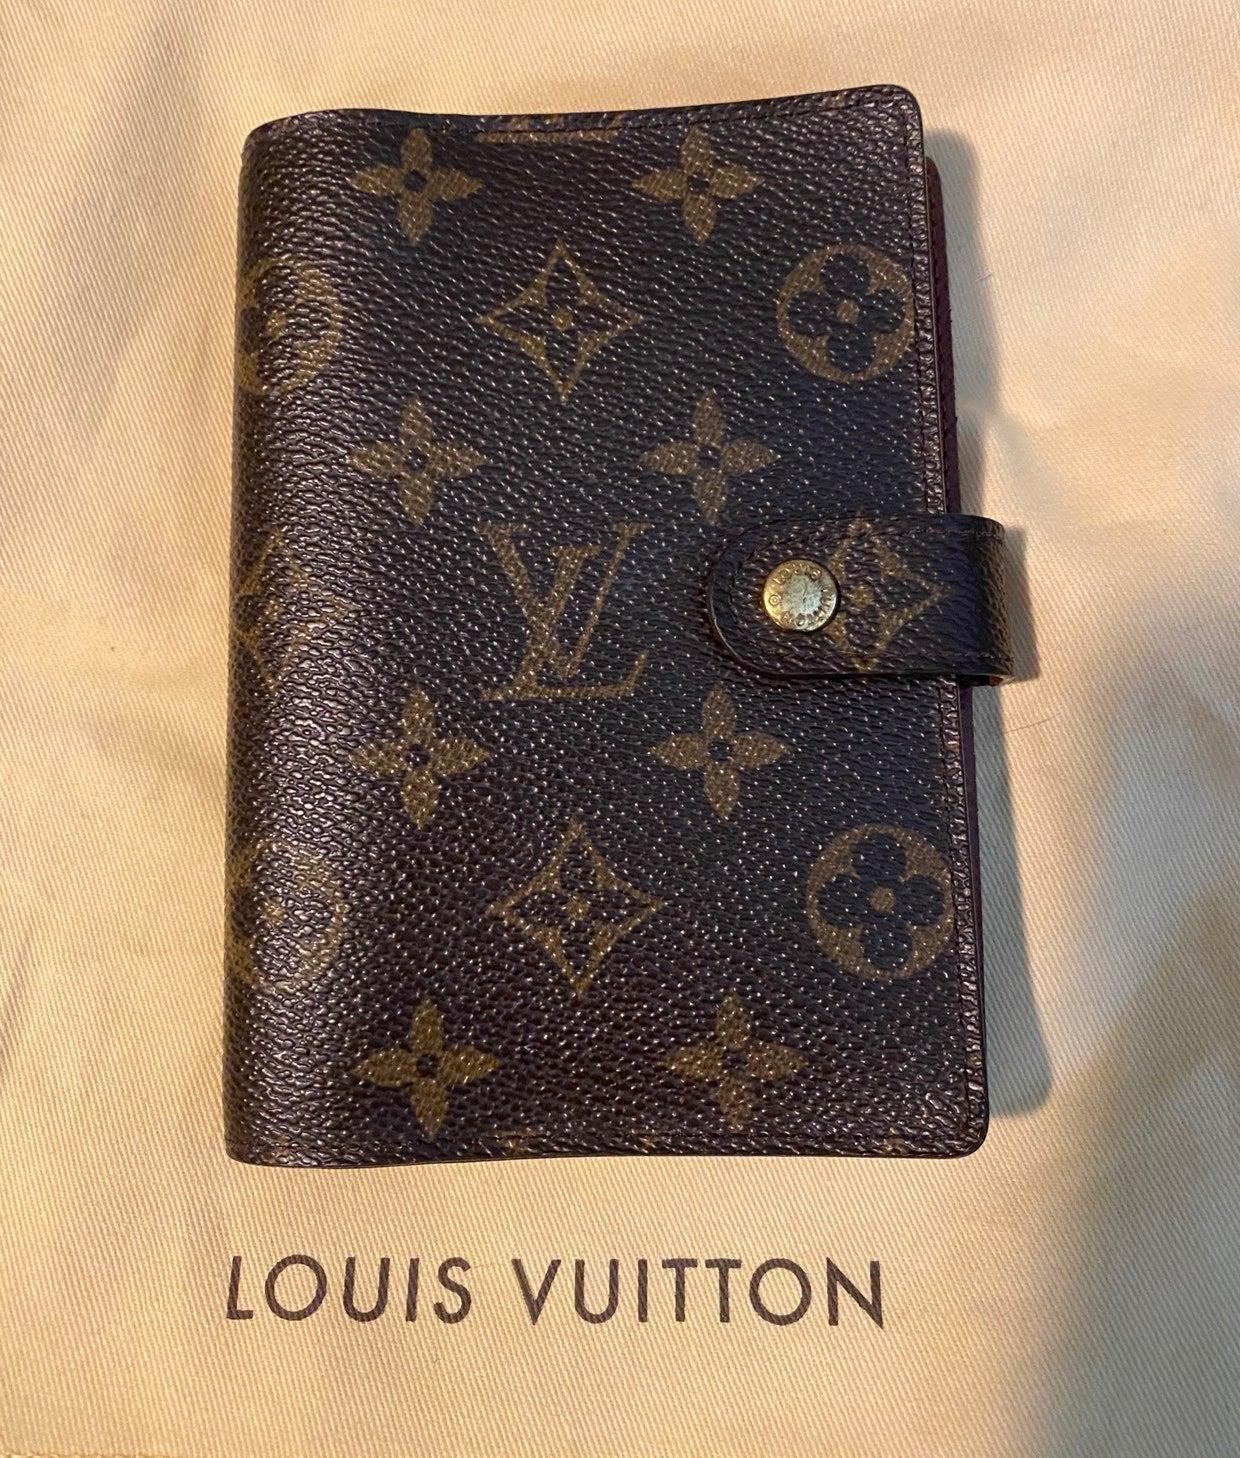 Louis Vuitton Agenda PM